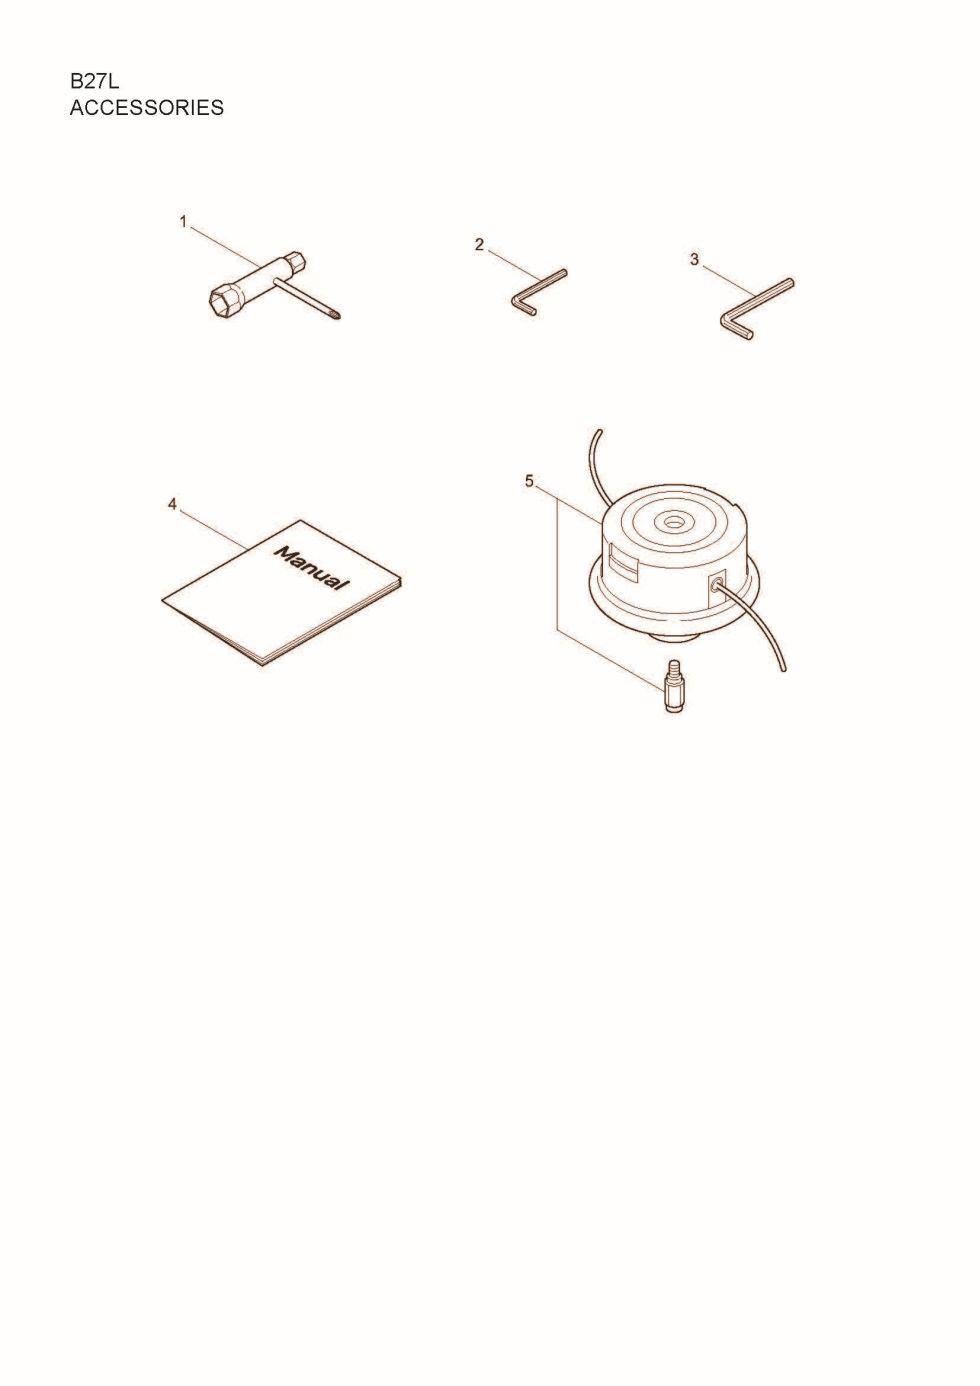 Maruyama Parts Lookup - B27L Parts Diagrams B27L Accessories